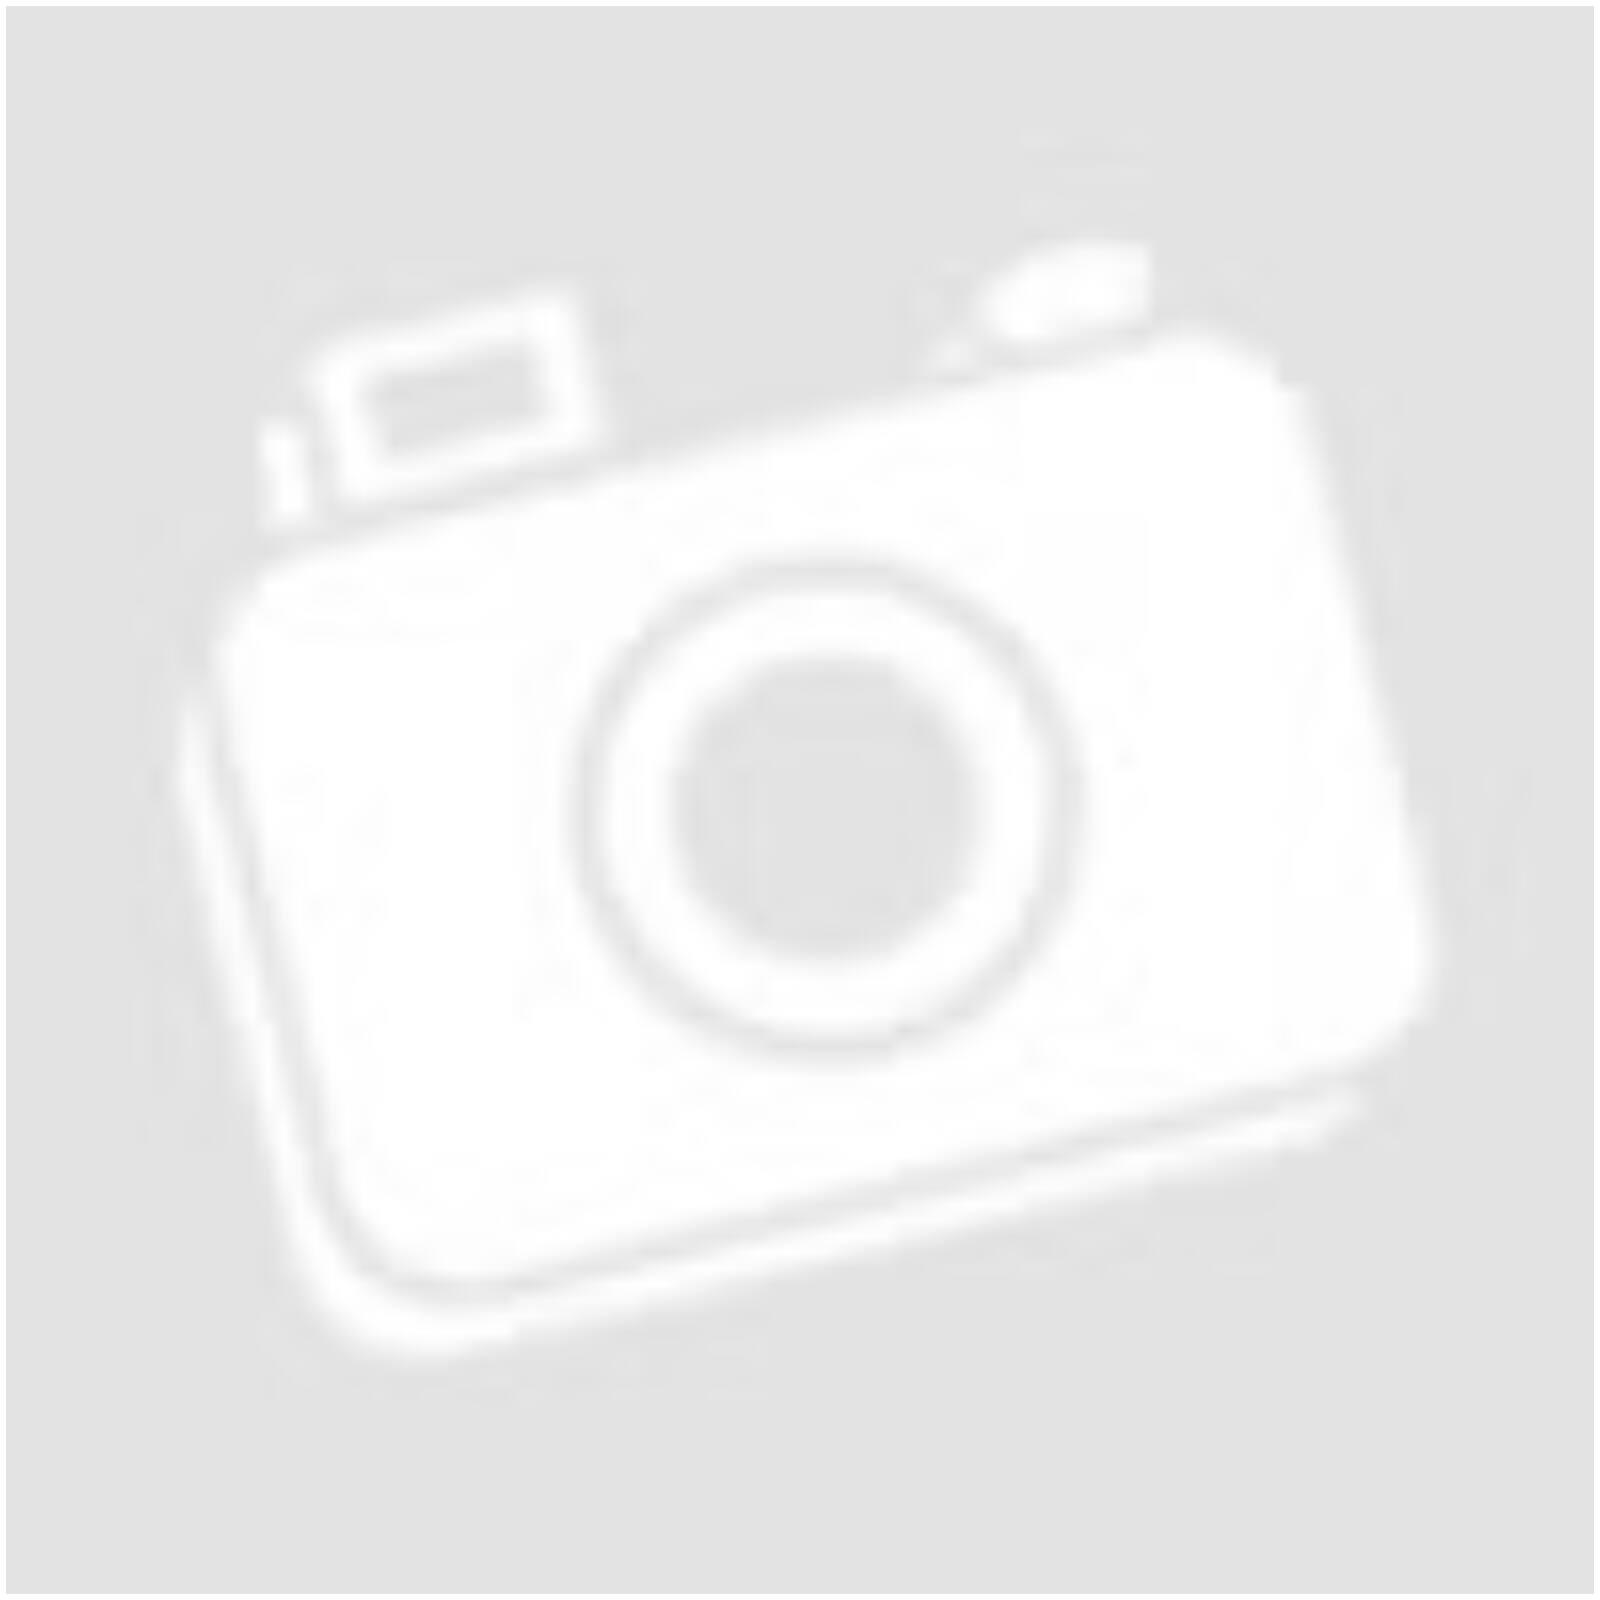 Körömlakk 8ml szines kupakos türkizkék